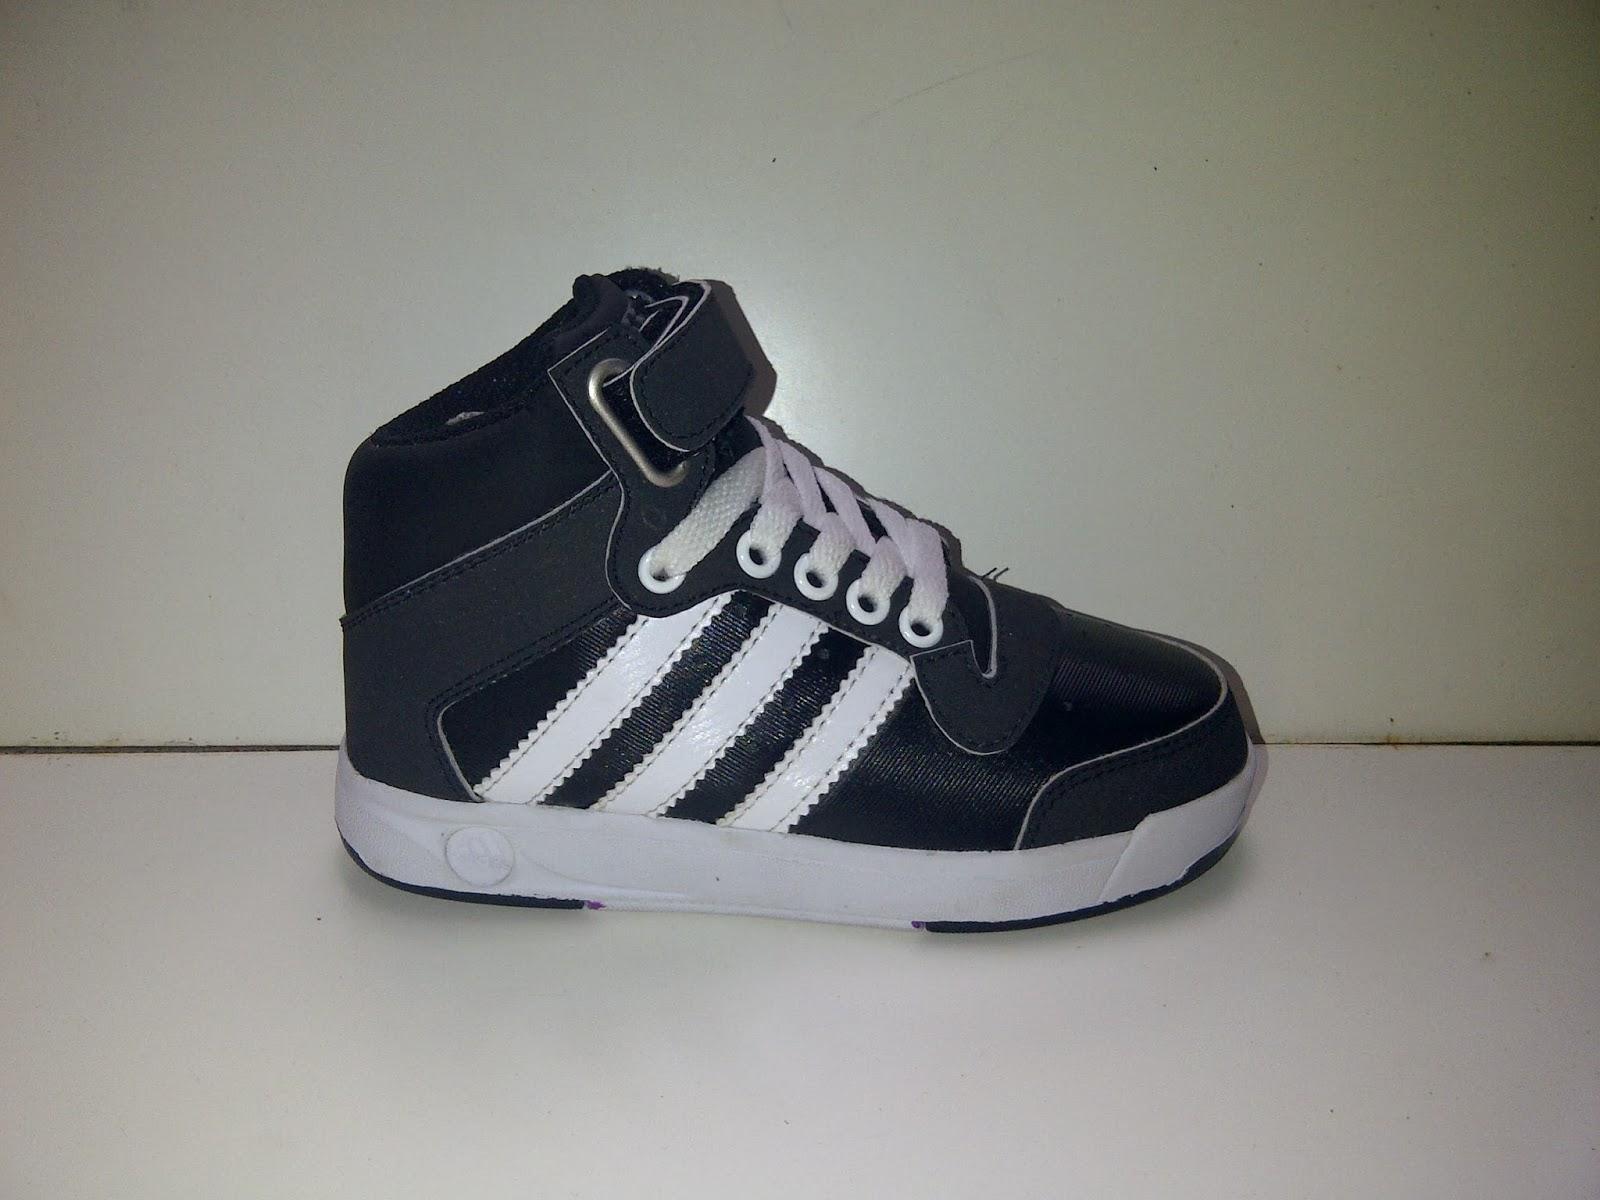 Sepatu Adidas Mini murah,sepatu anak